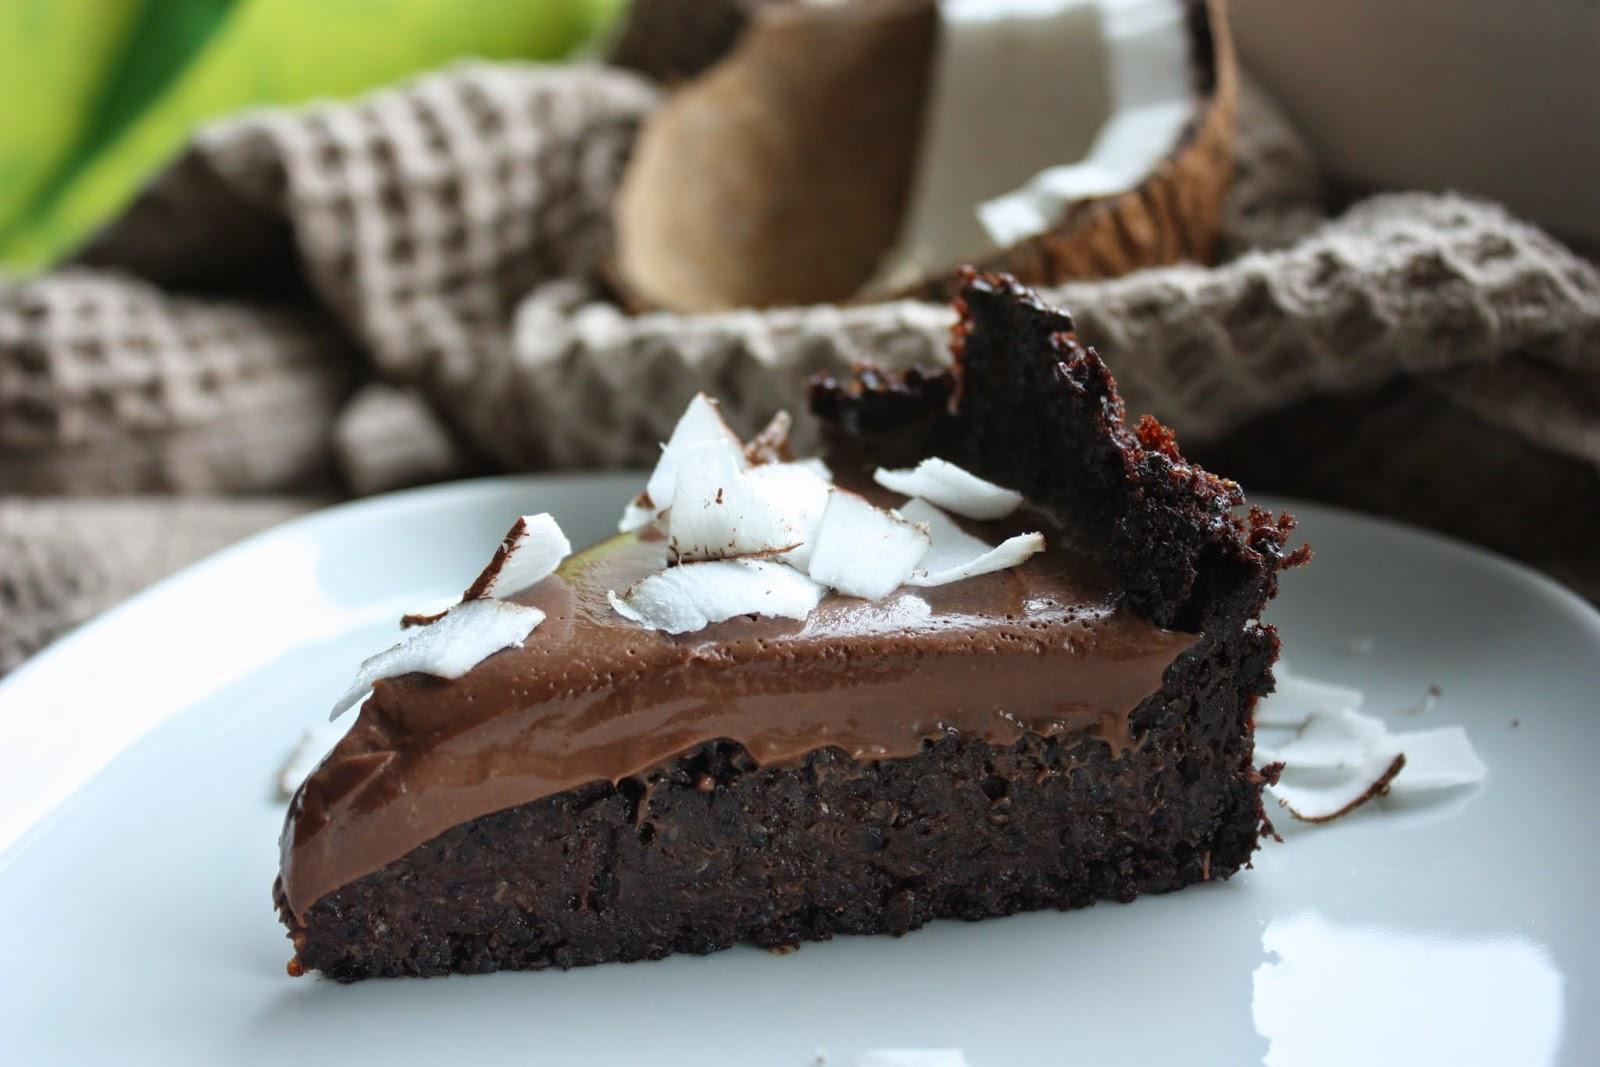 Gateau au quinoa et chocolat